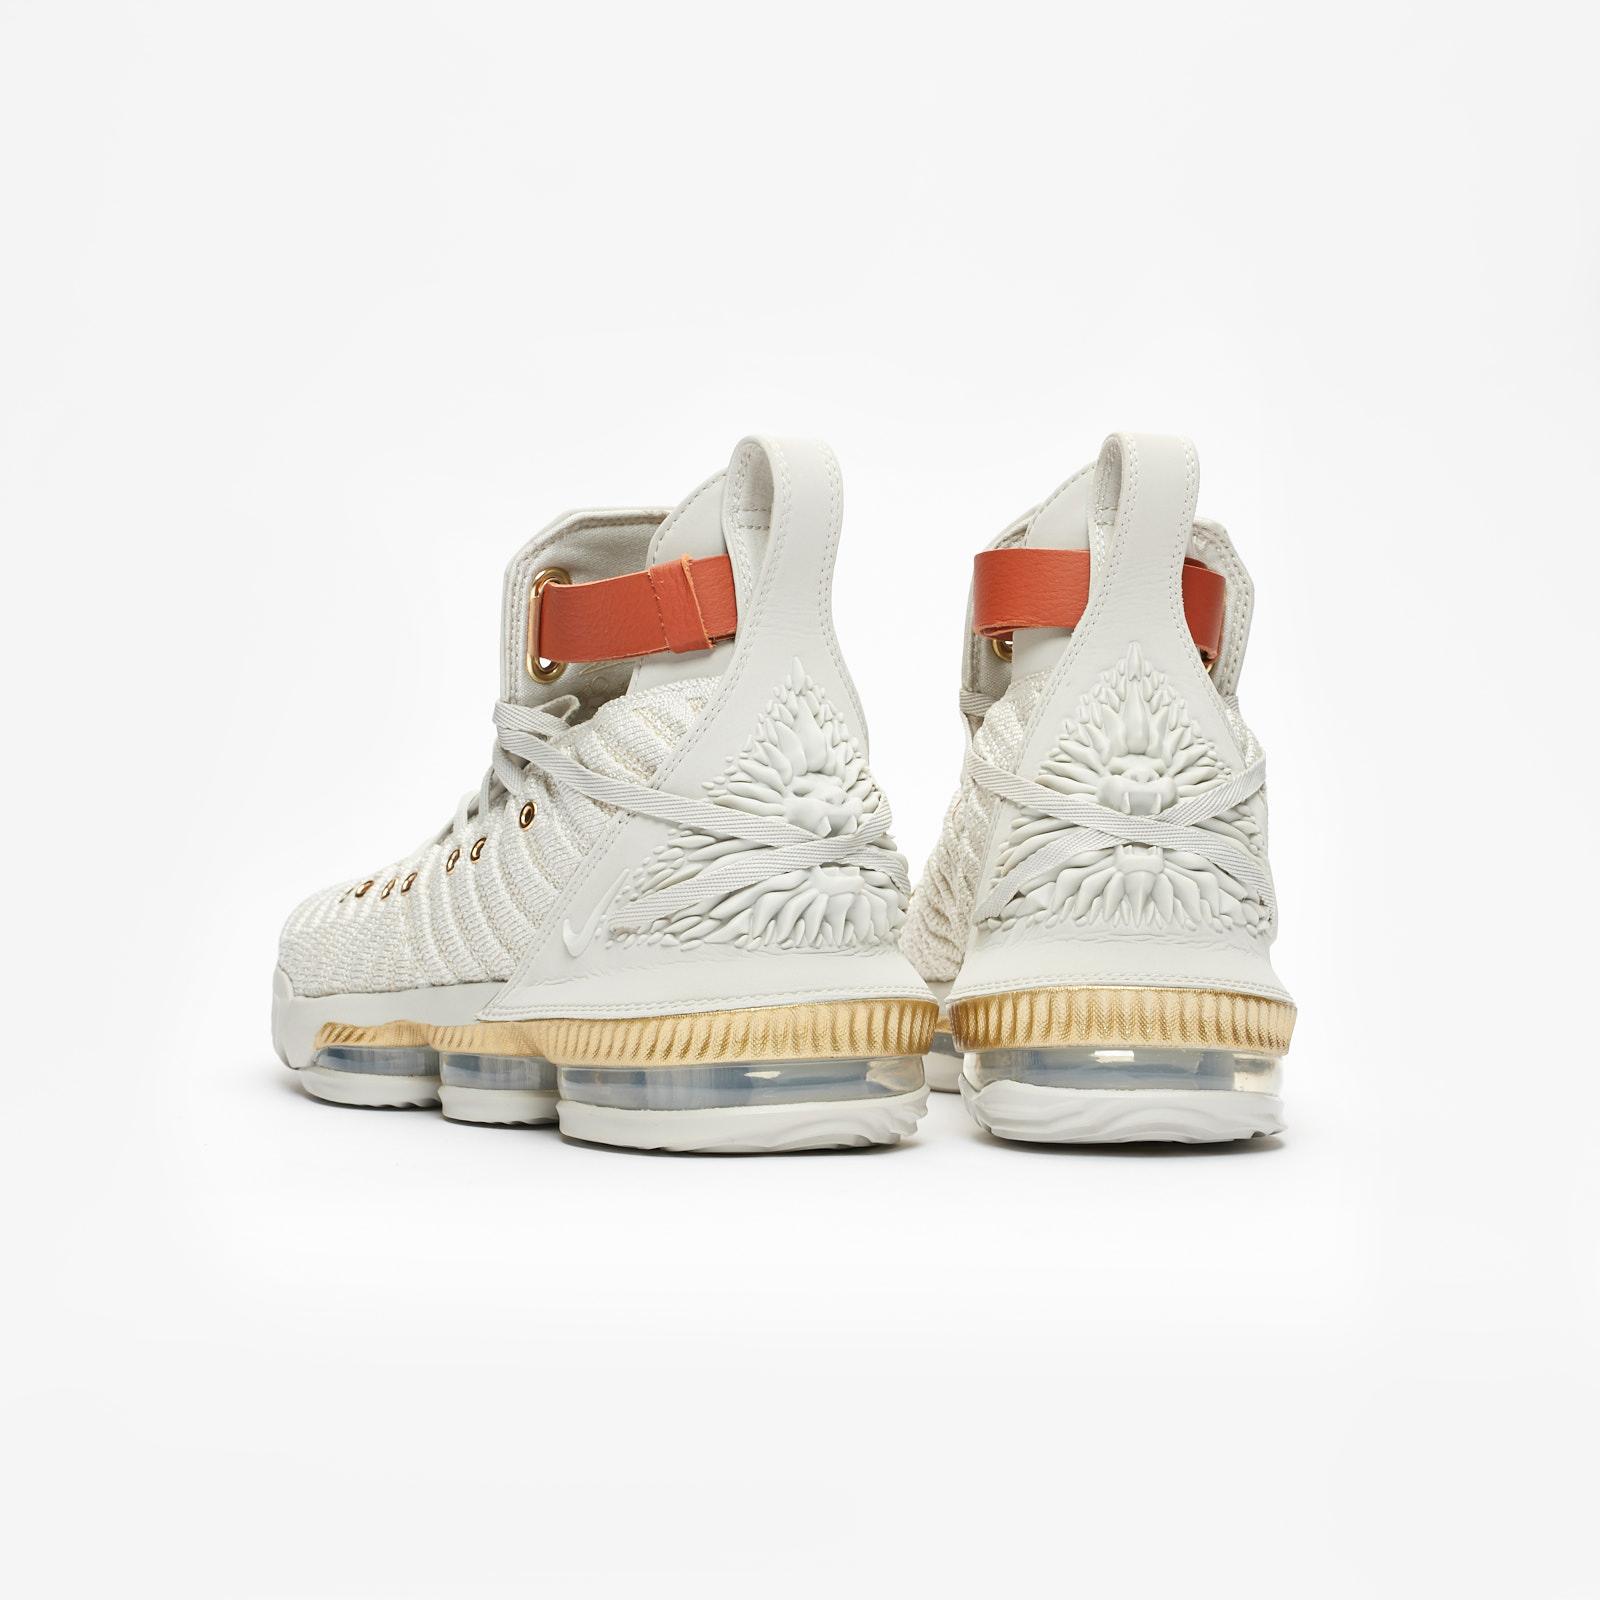 Nike Wmns LeBron XVI LMTD - Bq6583-100